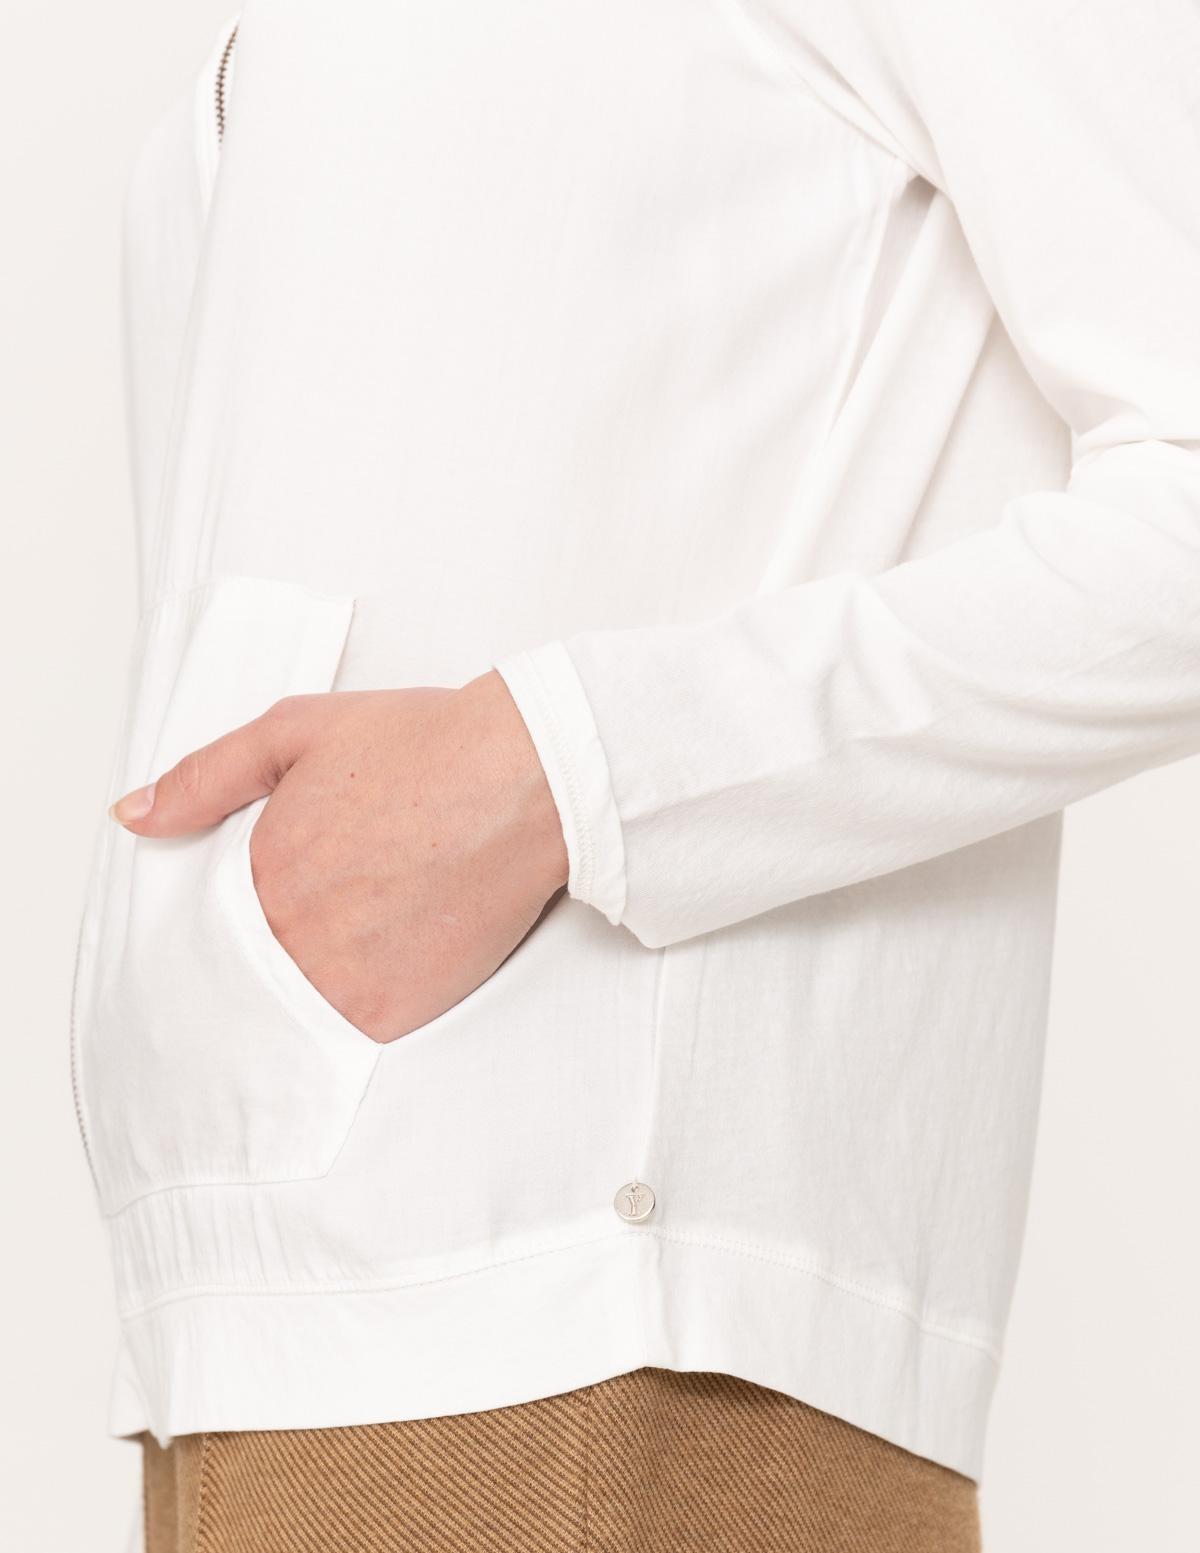 Chaqueta tejidos combinados - Ítem2